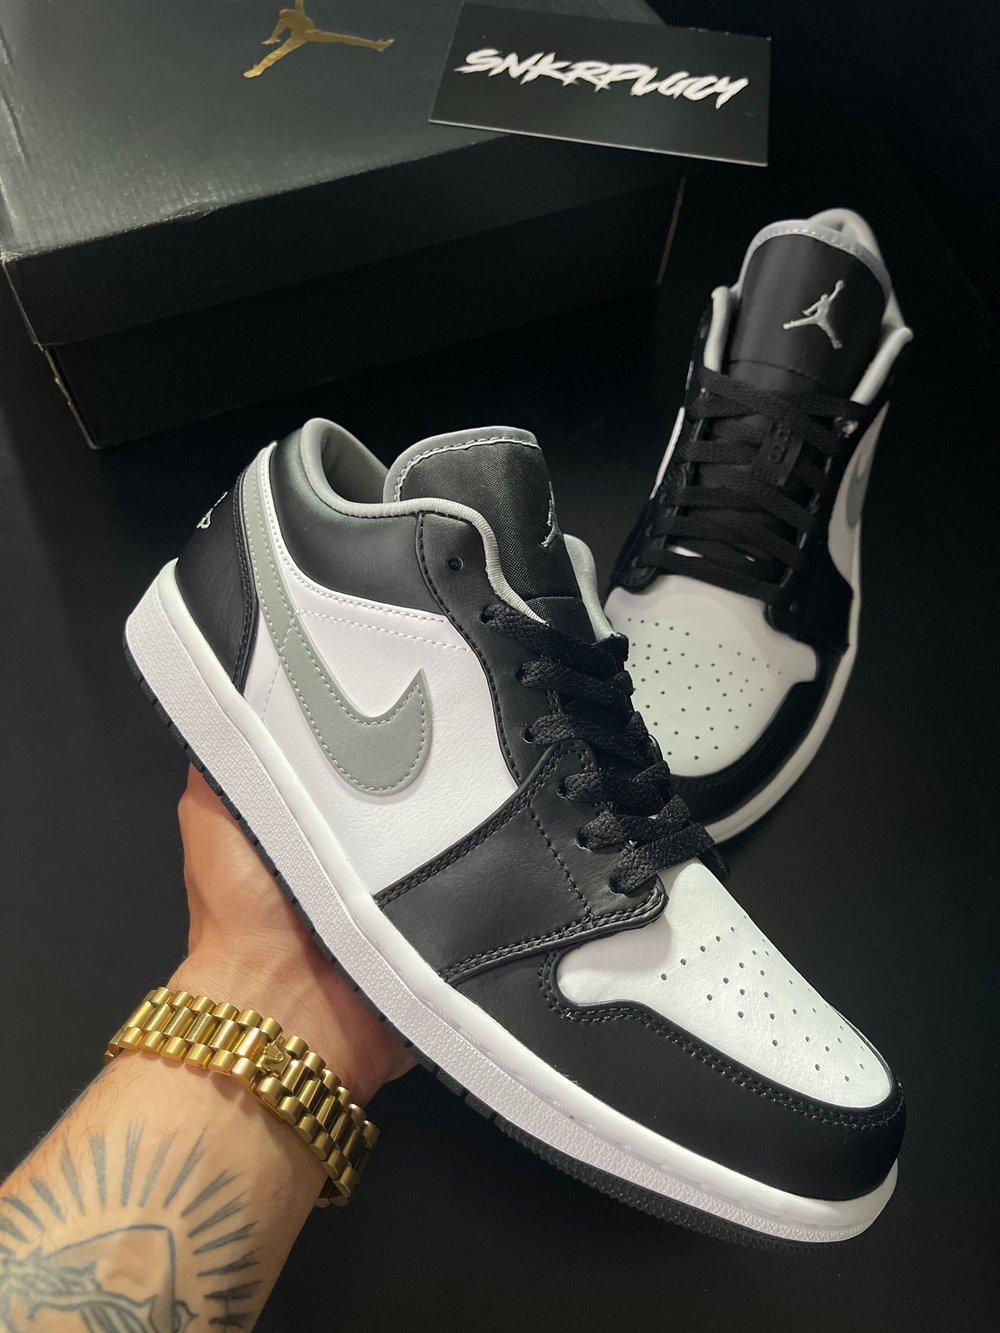 Air Jordan 1 Low / Black, White, Grey